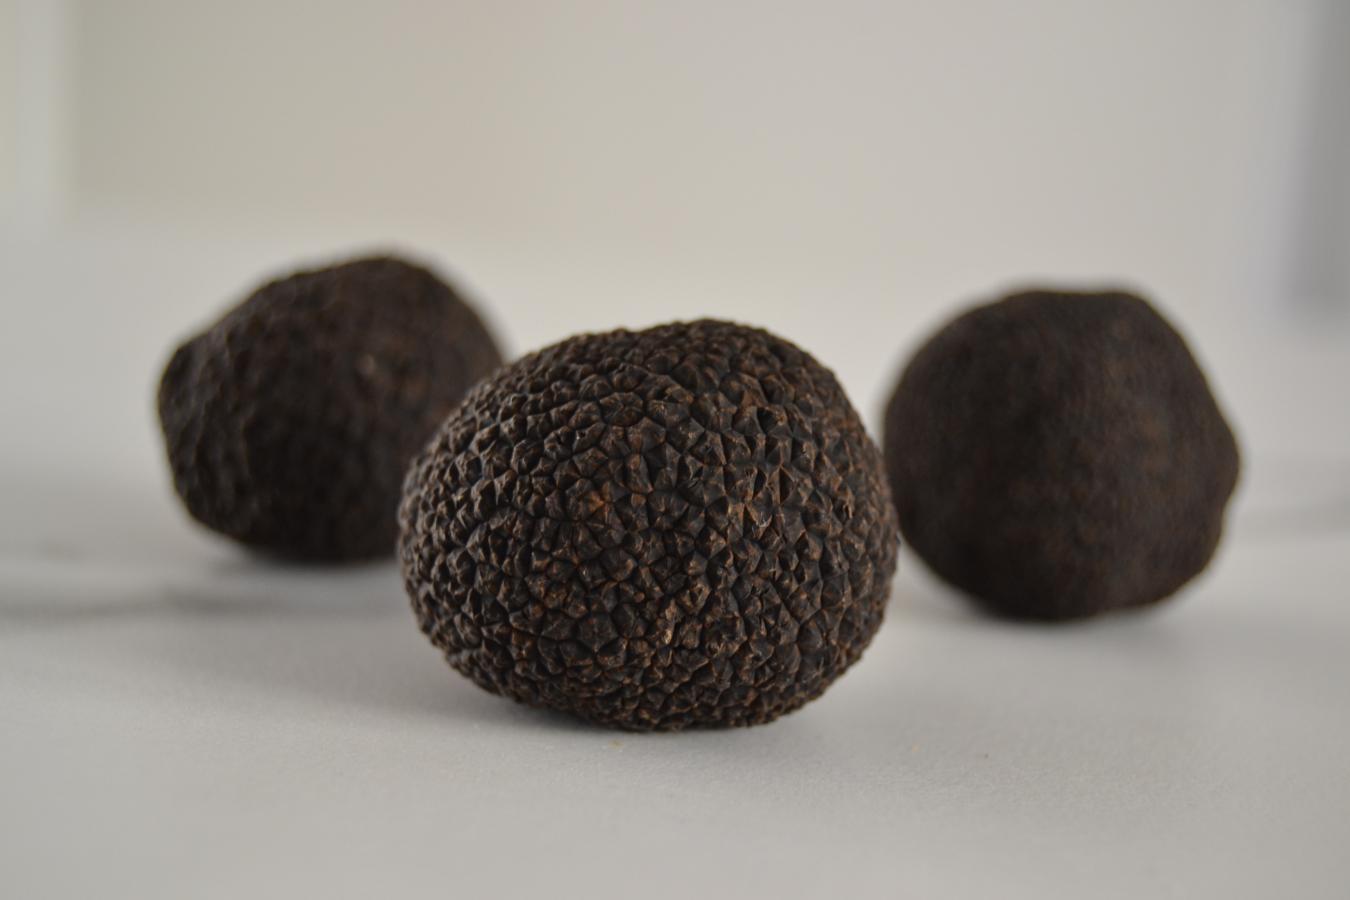 Fresh Black Winter Truffles (Tuber Melanosporum) - LIMITED DELIVERY DAYS